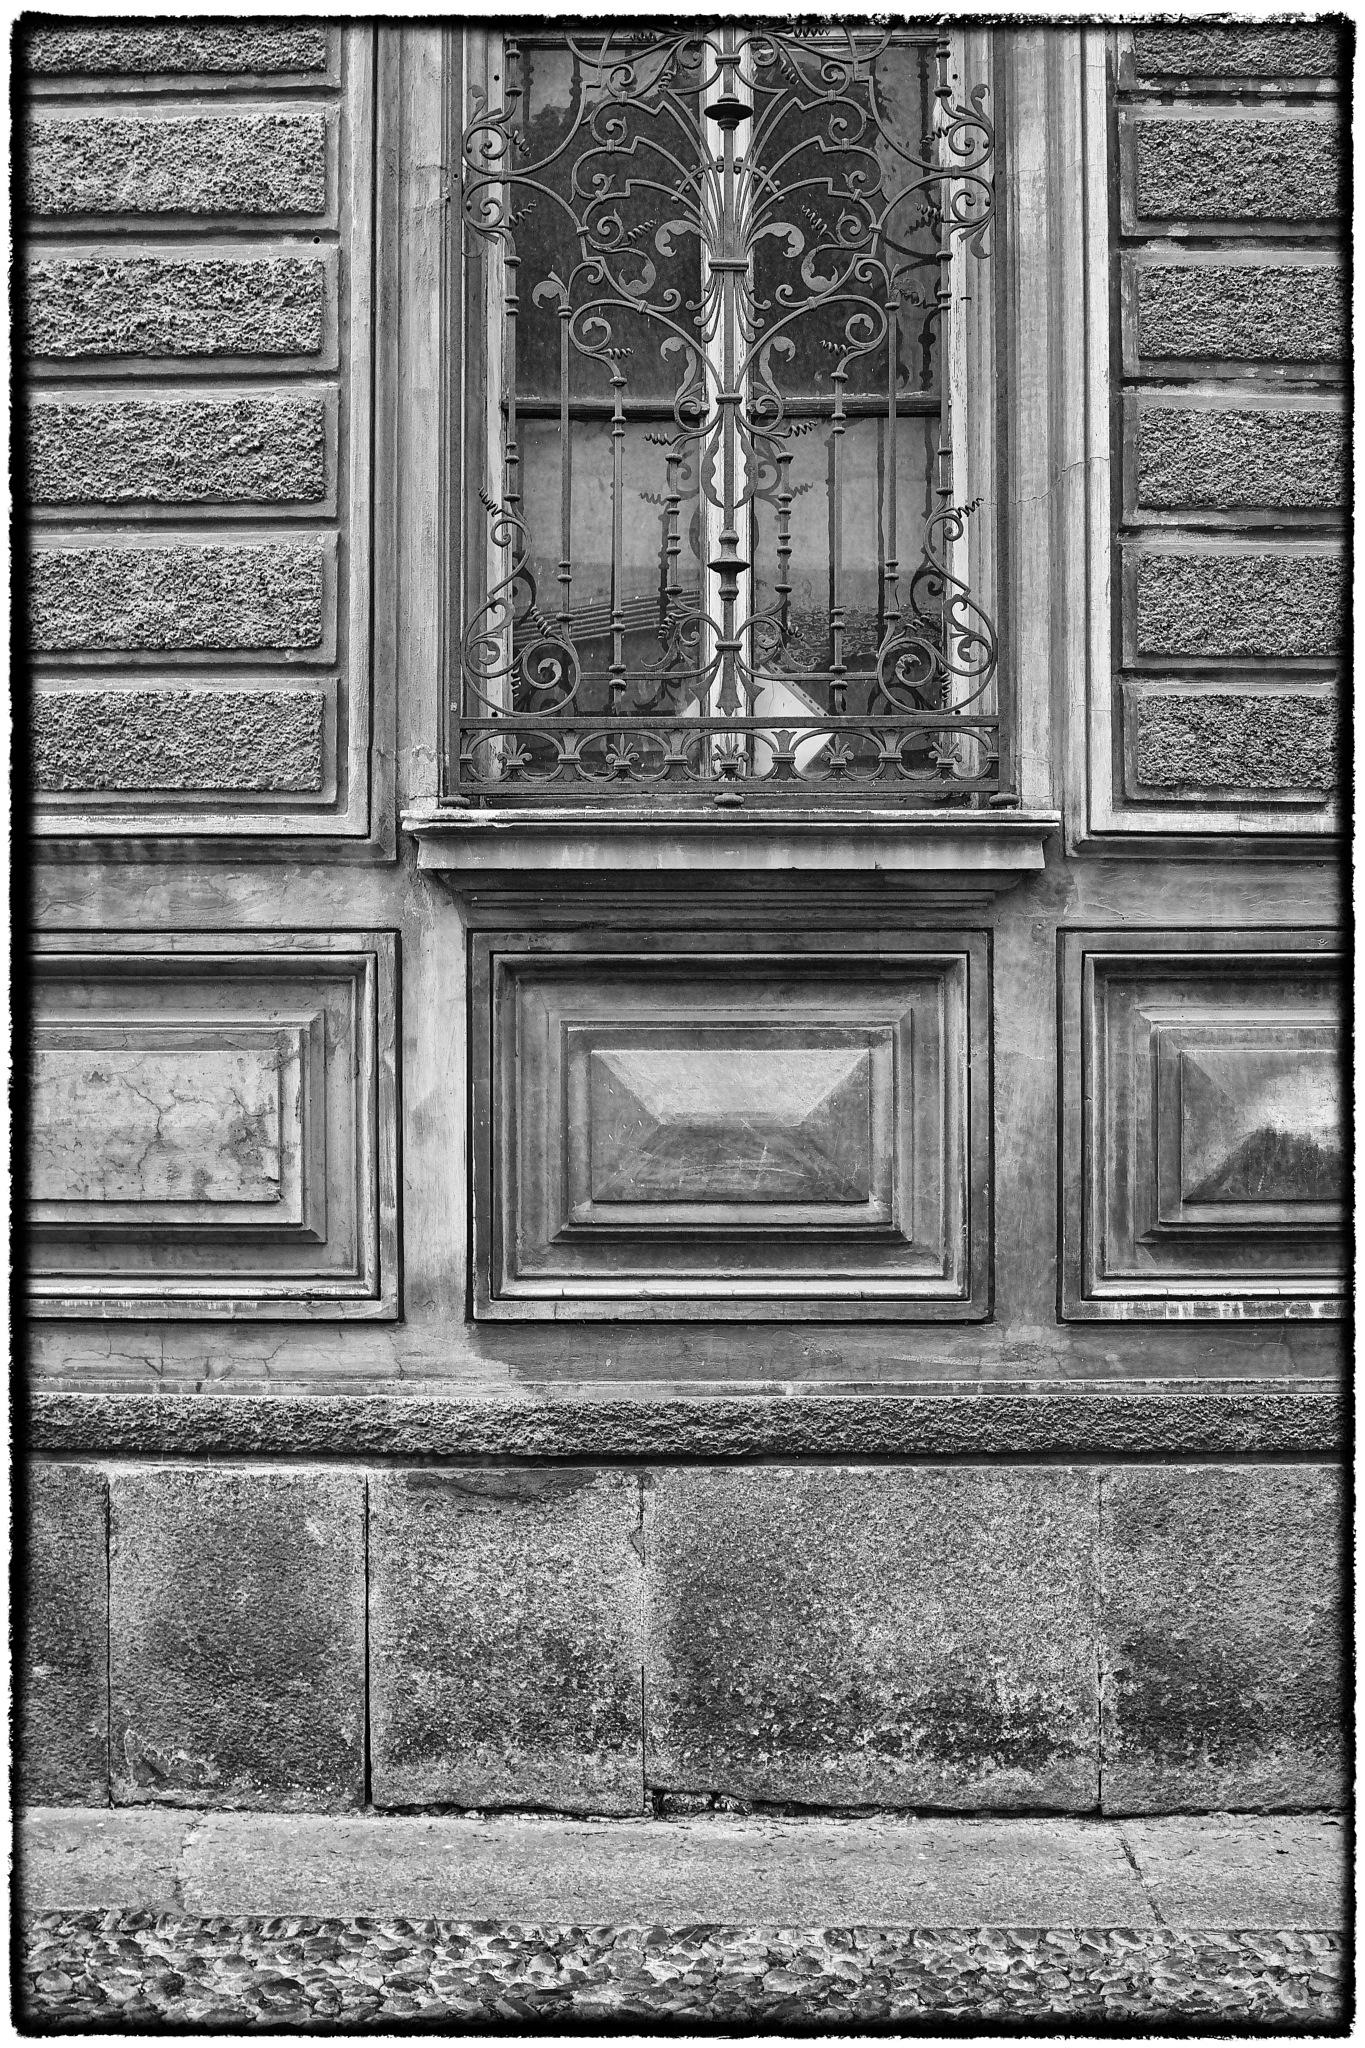 casa bossi a Novara by bcorech